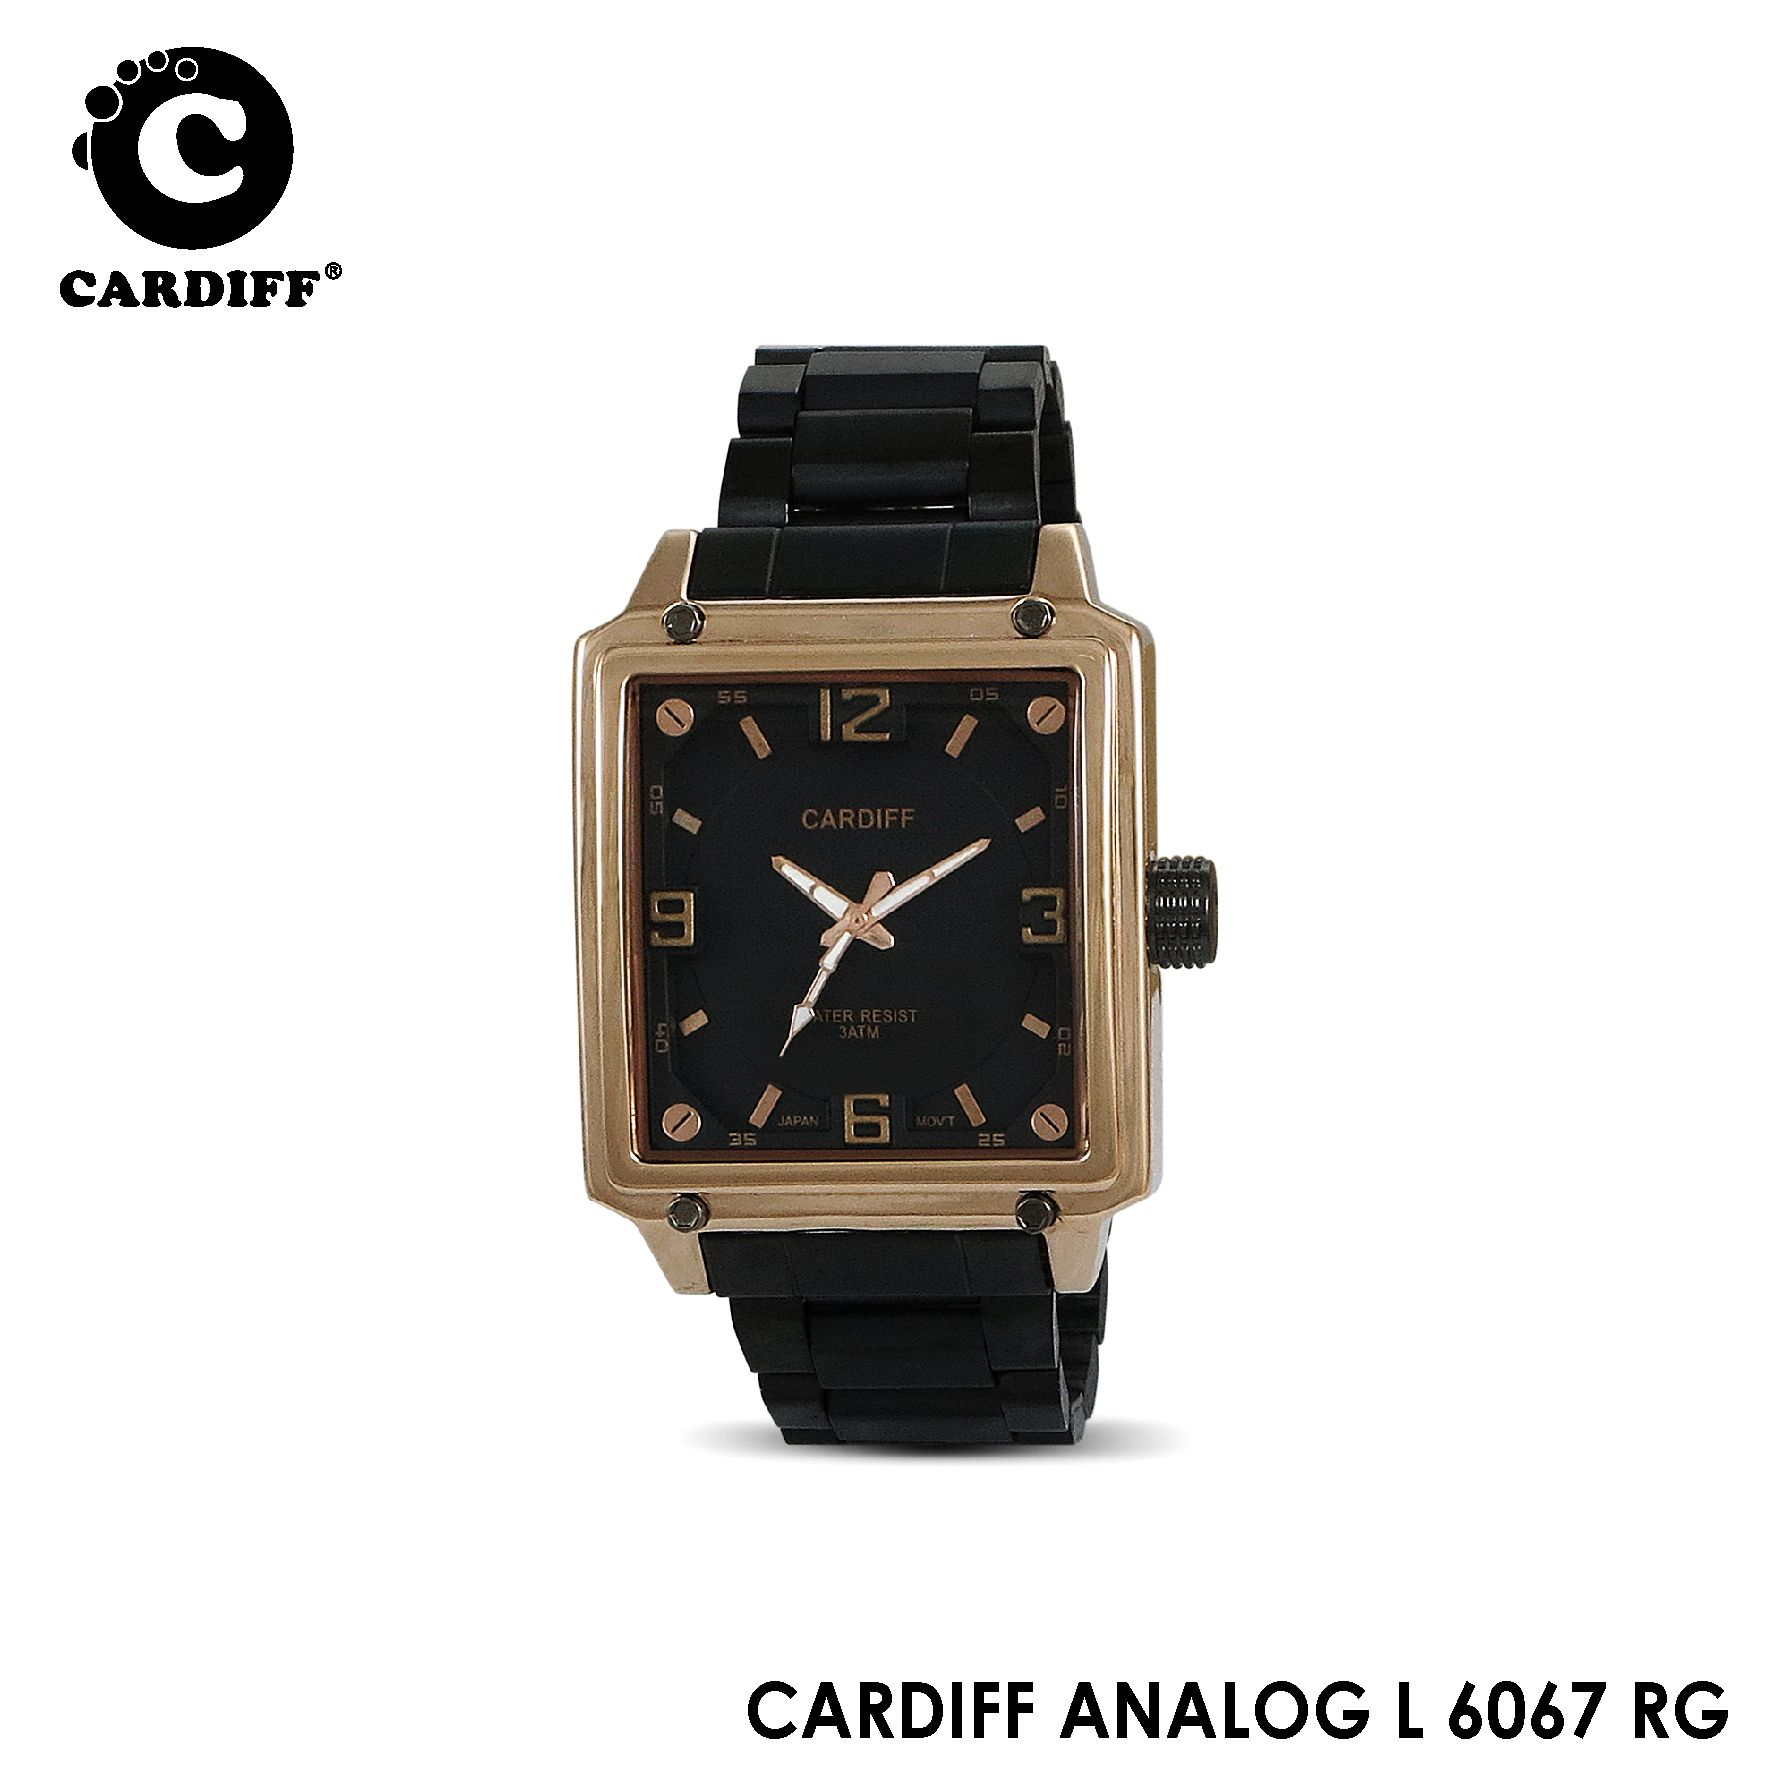 Cardiff Analog L 6067